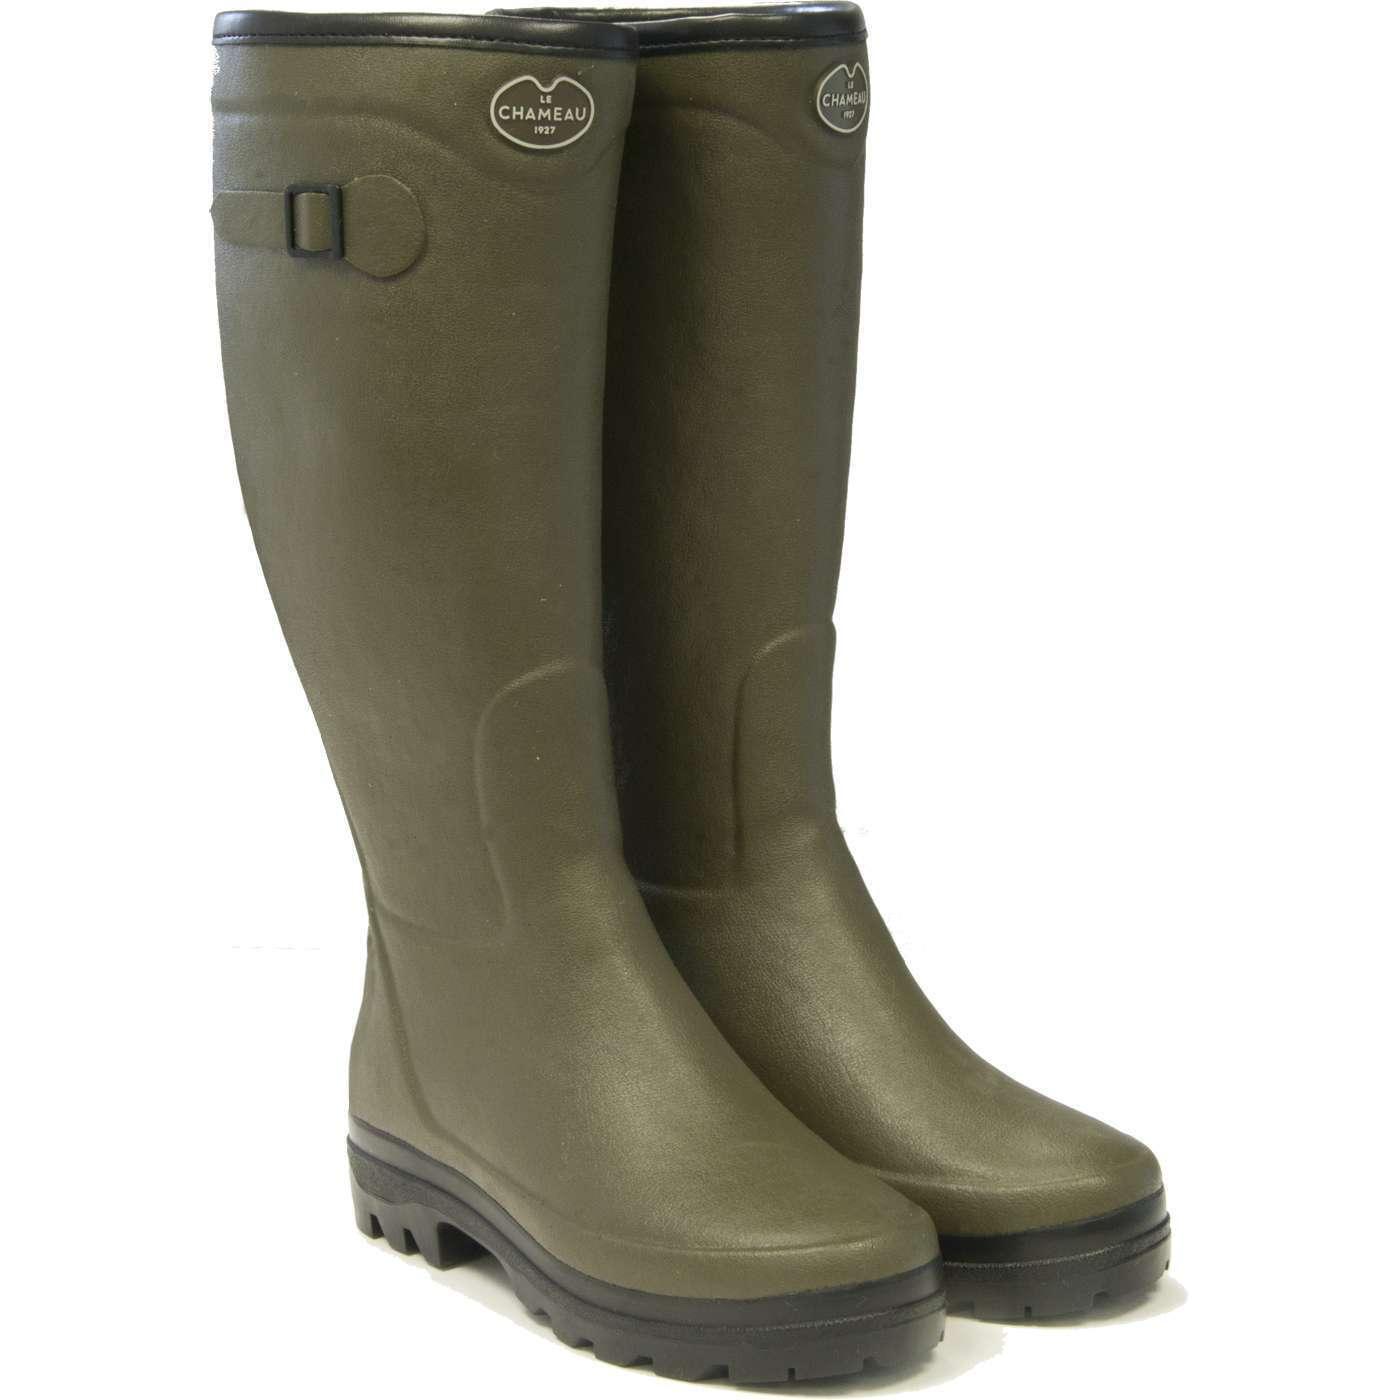 Le Chameau Country Fouree Ladies Green wellington boots FREE UK P&P